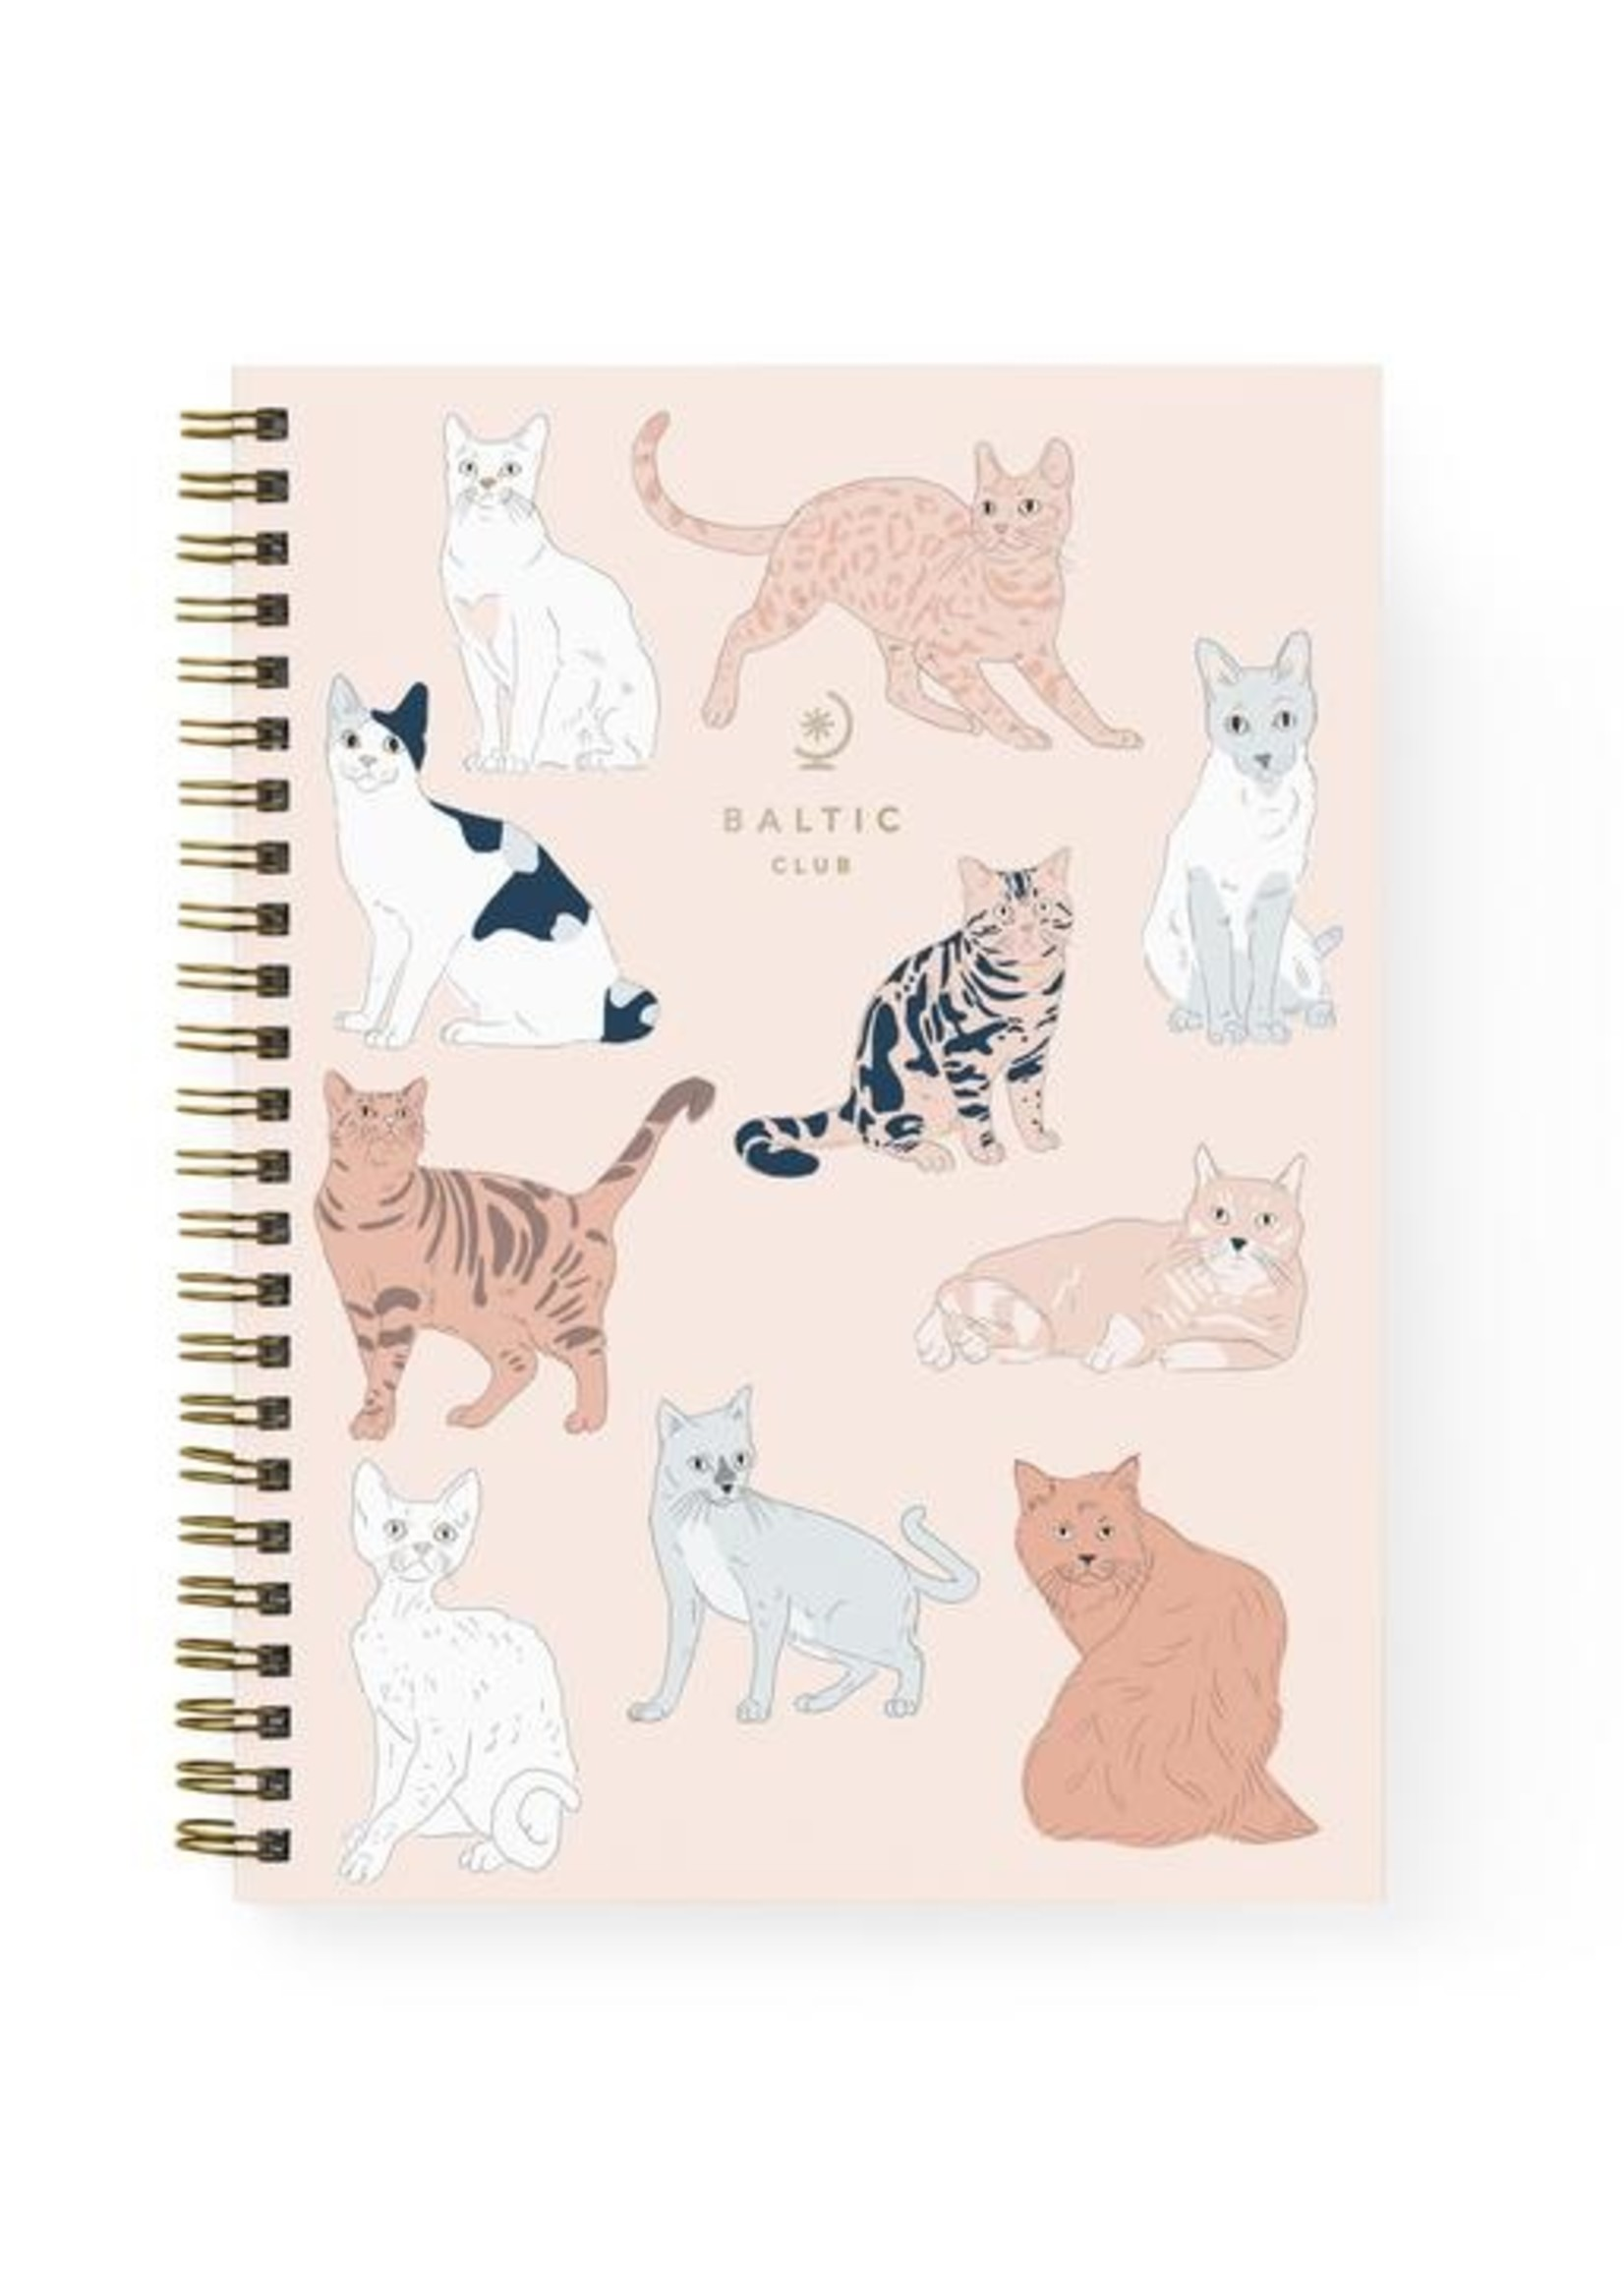 Baltic Club Baltic Club - Cat Spiral Notebook